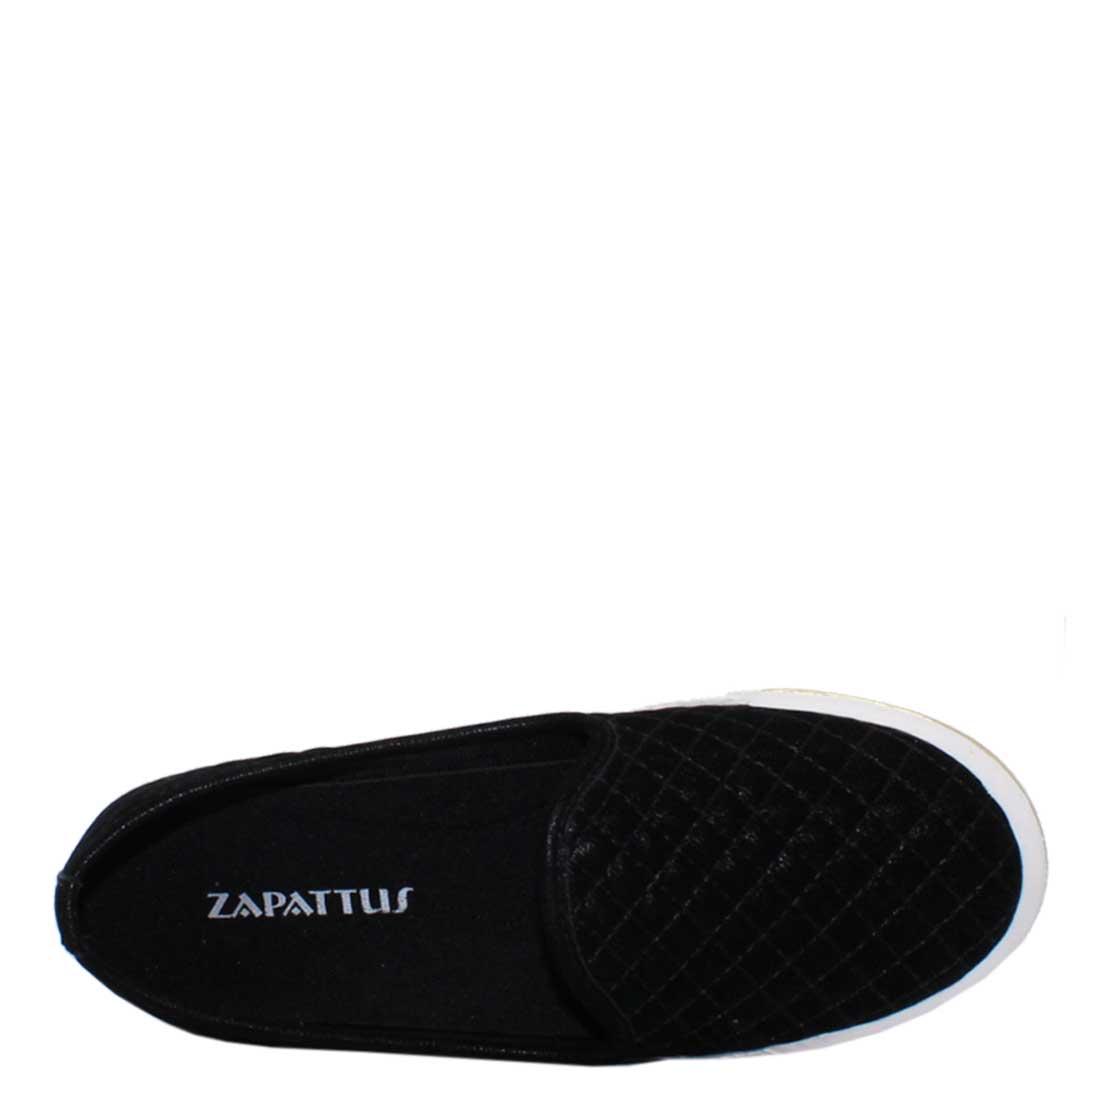 Tênis Slip On Zapattus